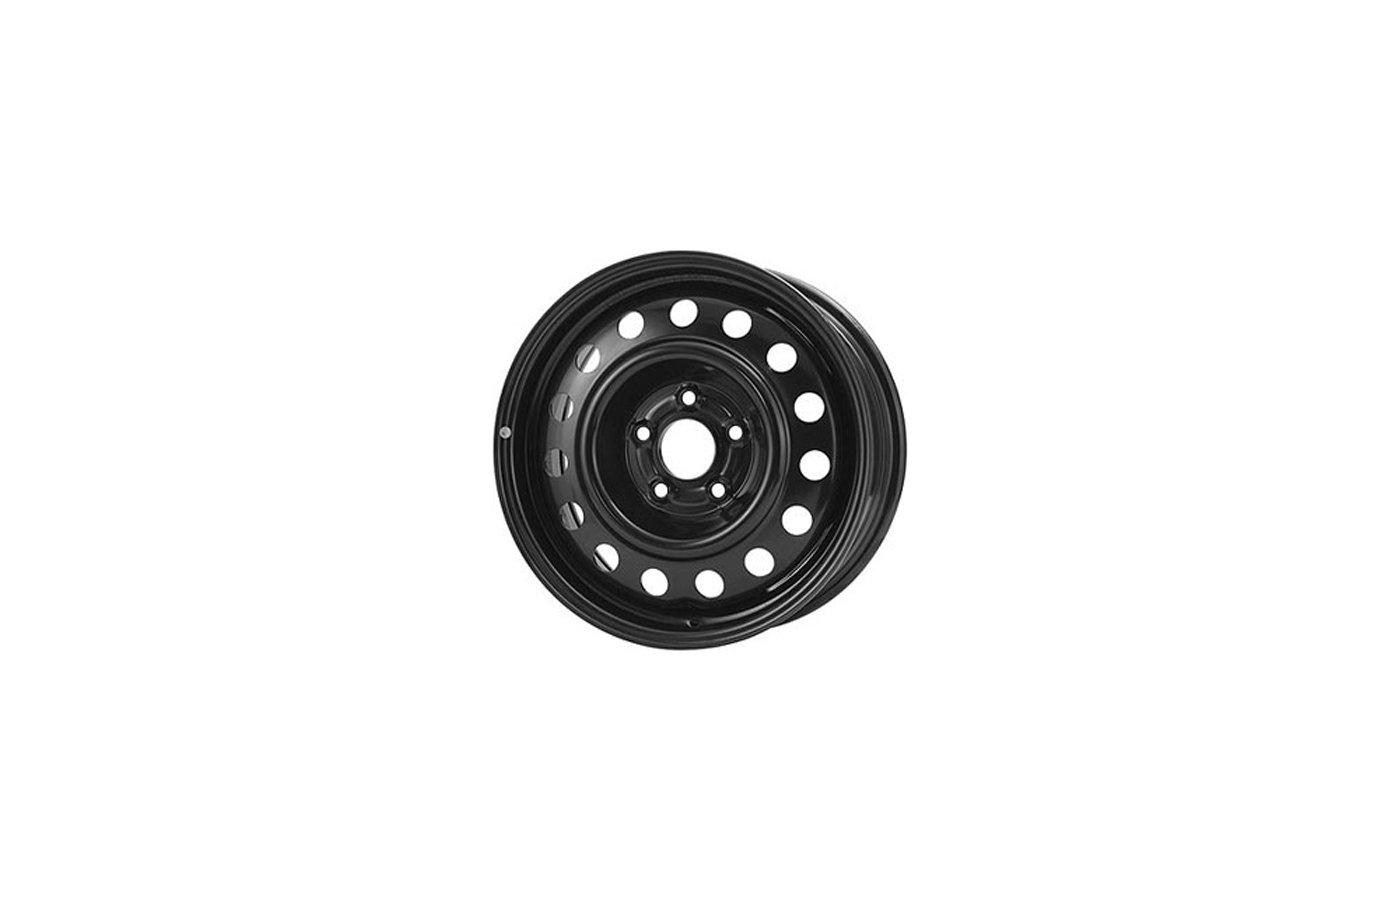 Диск ТЗСК Ford Focus 6x15/5x108 D63.3 ET52.5 S